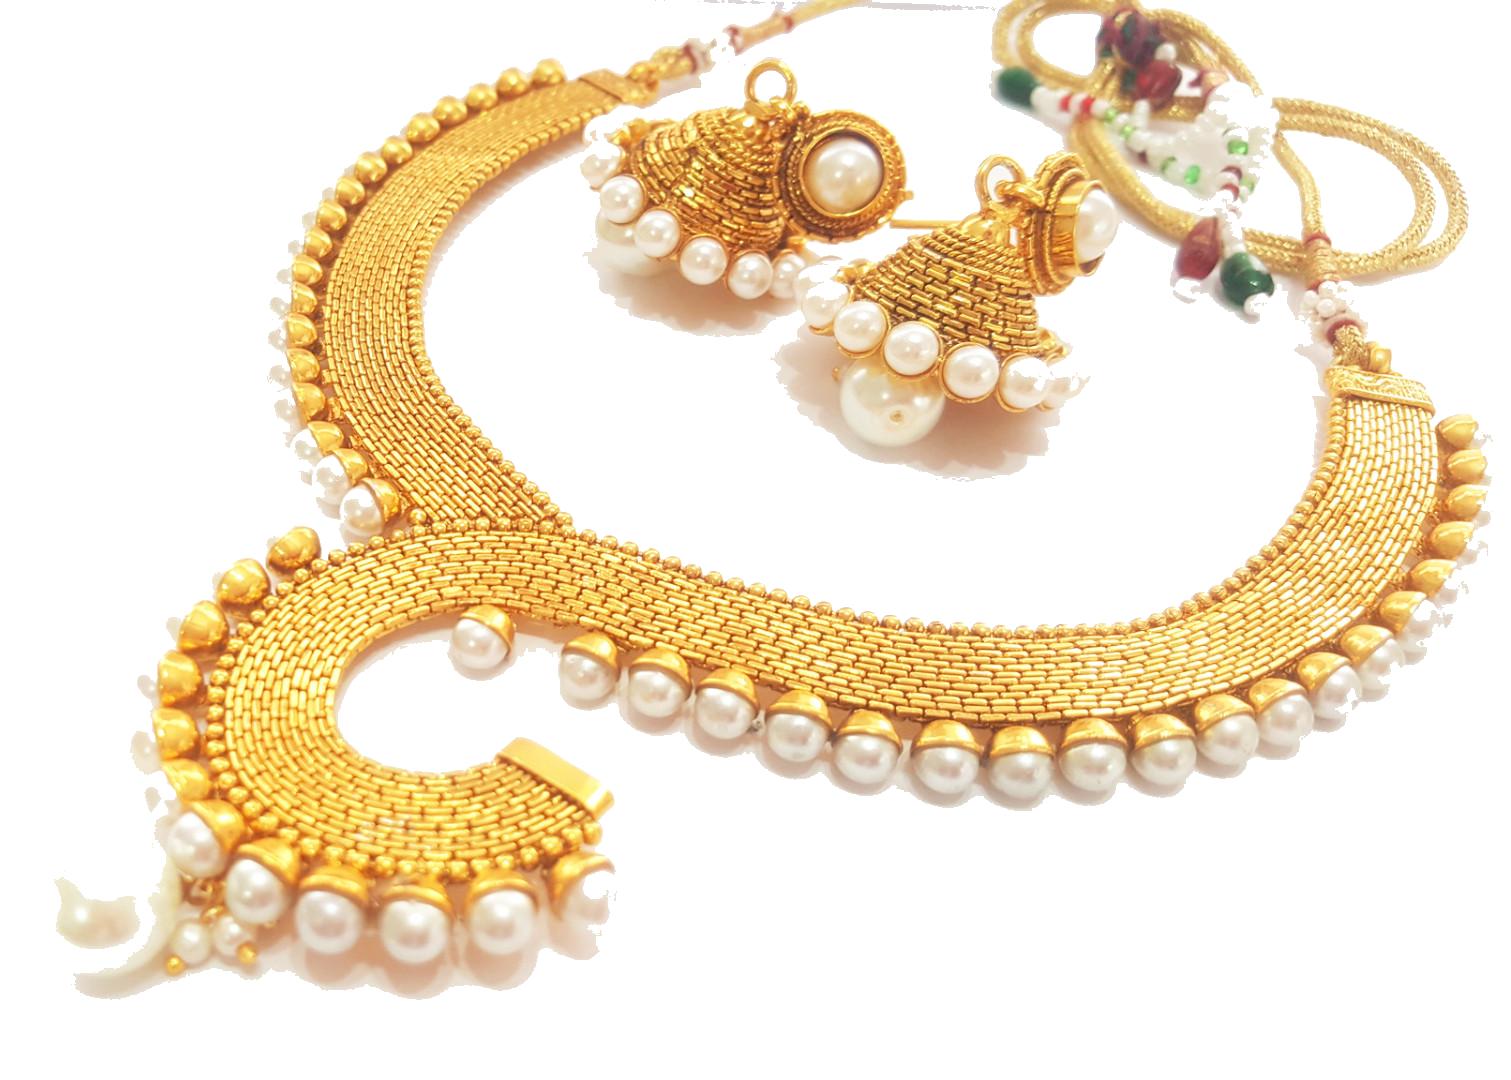 Imitation Jewellery PNG - 69517